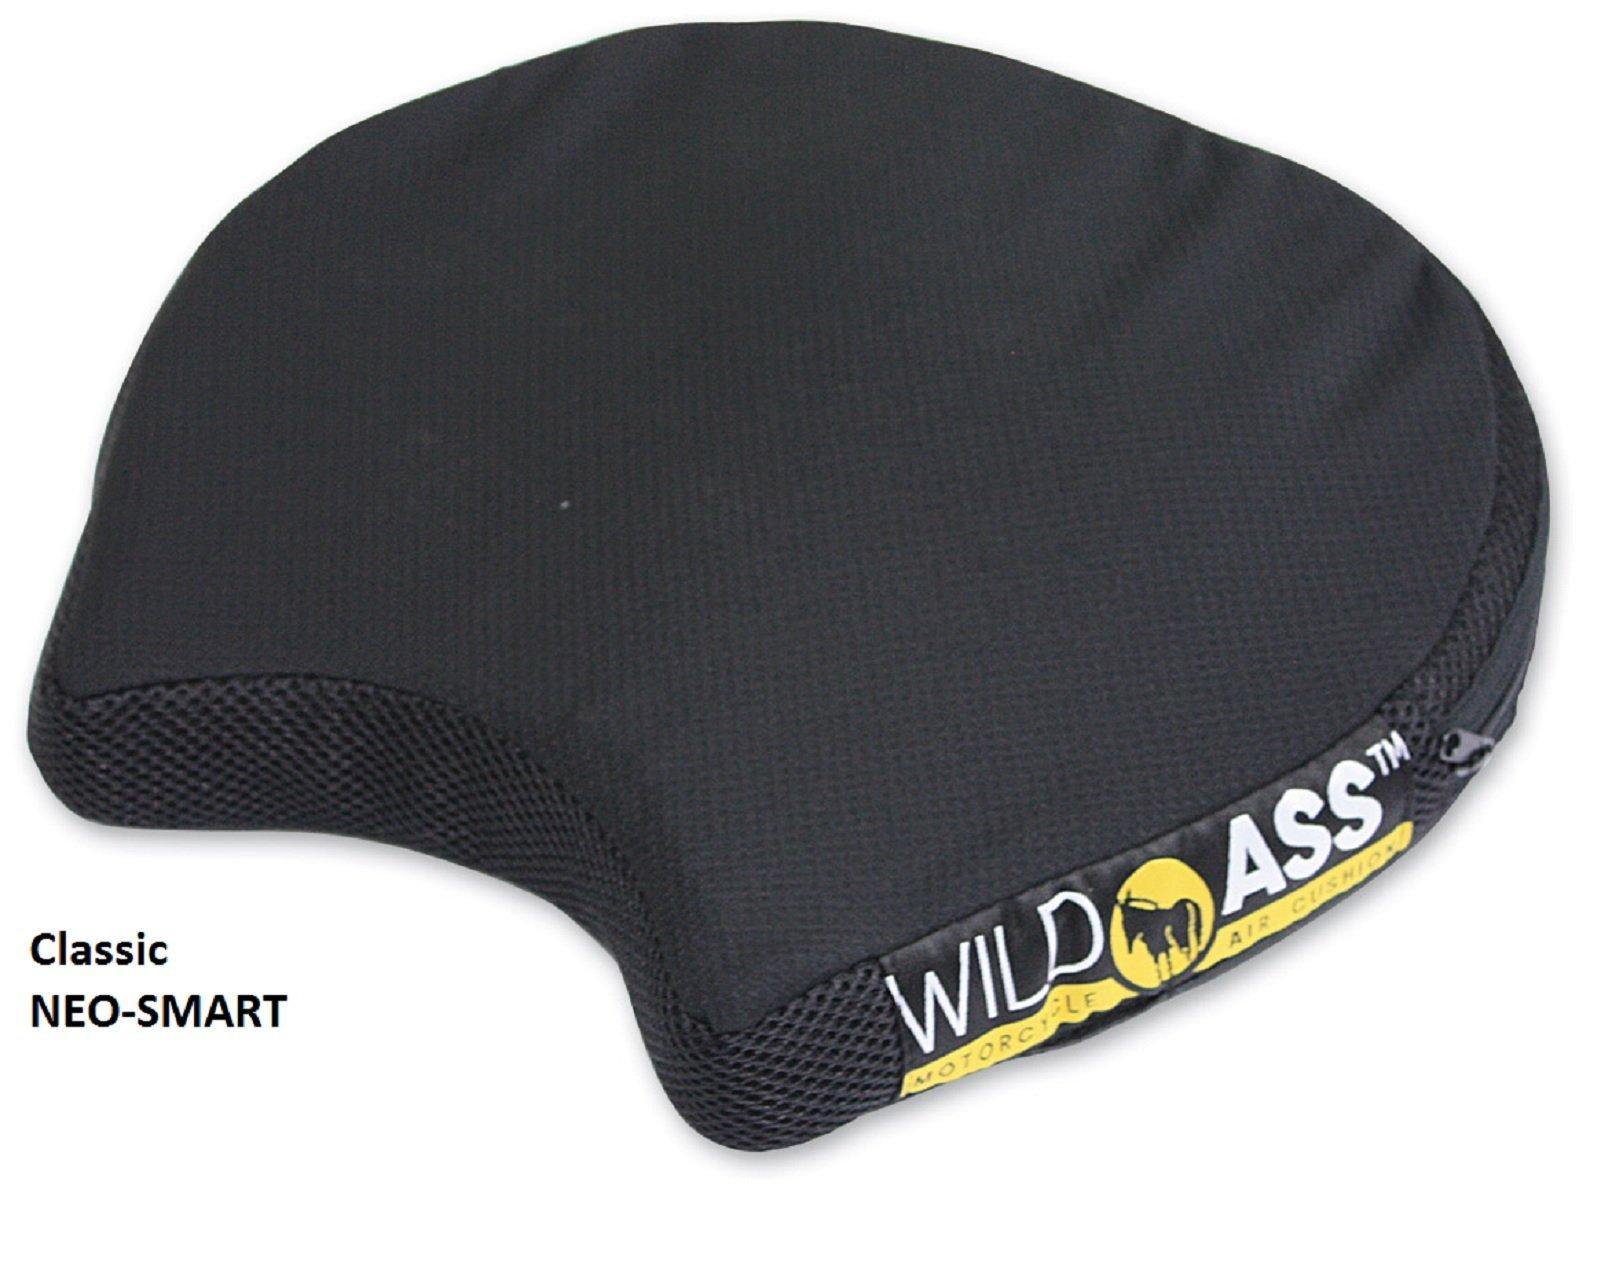 Wild Ass Smart Design Classic Air Cushion Seat Pad NEO-SMART